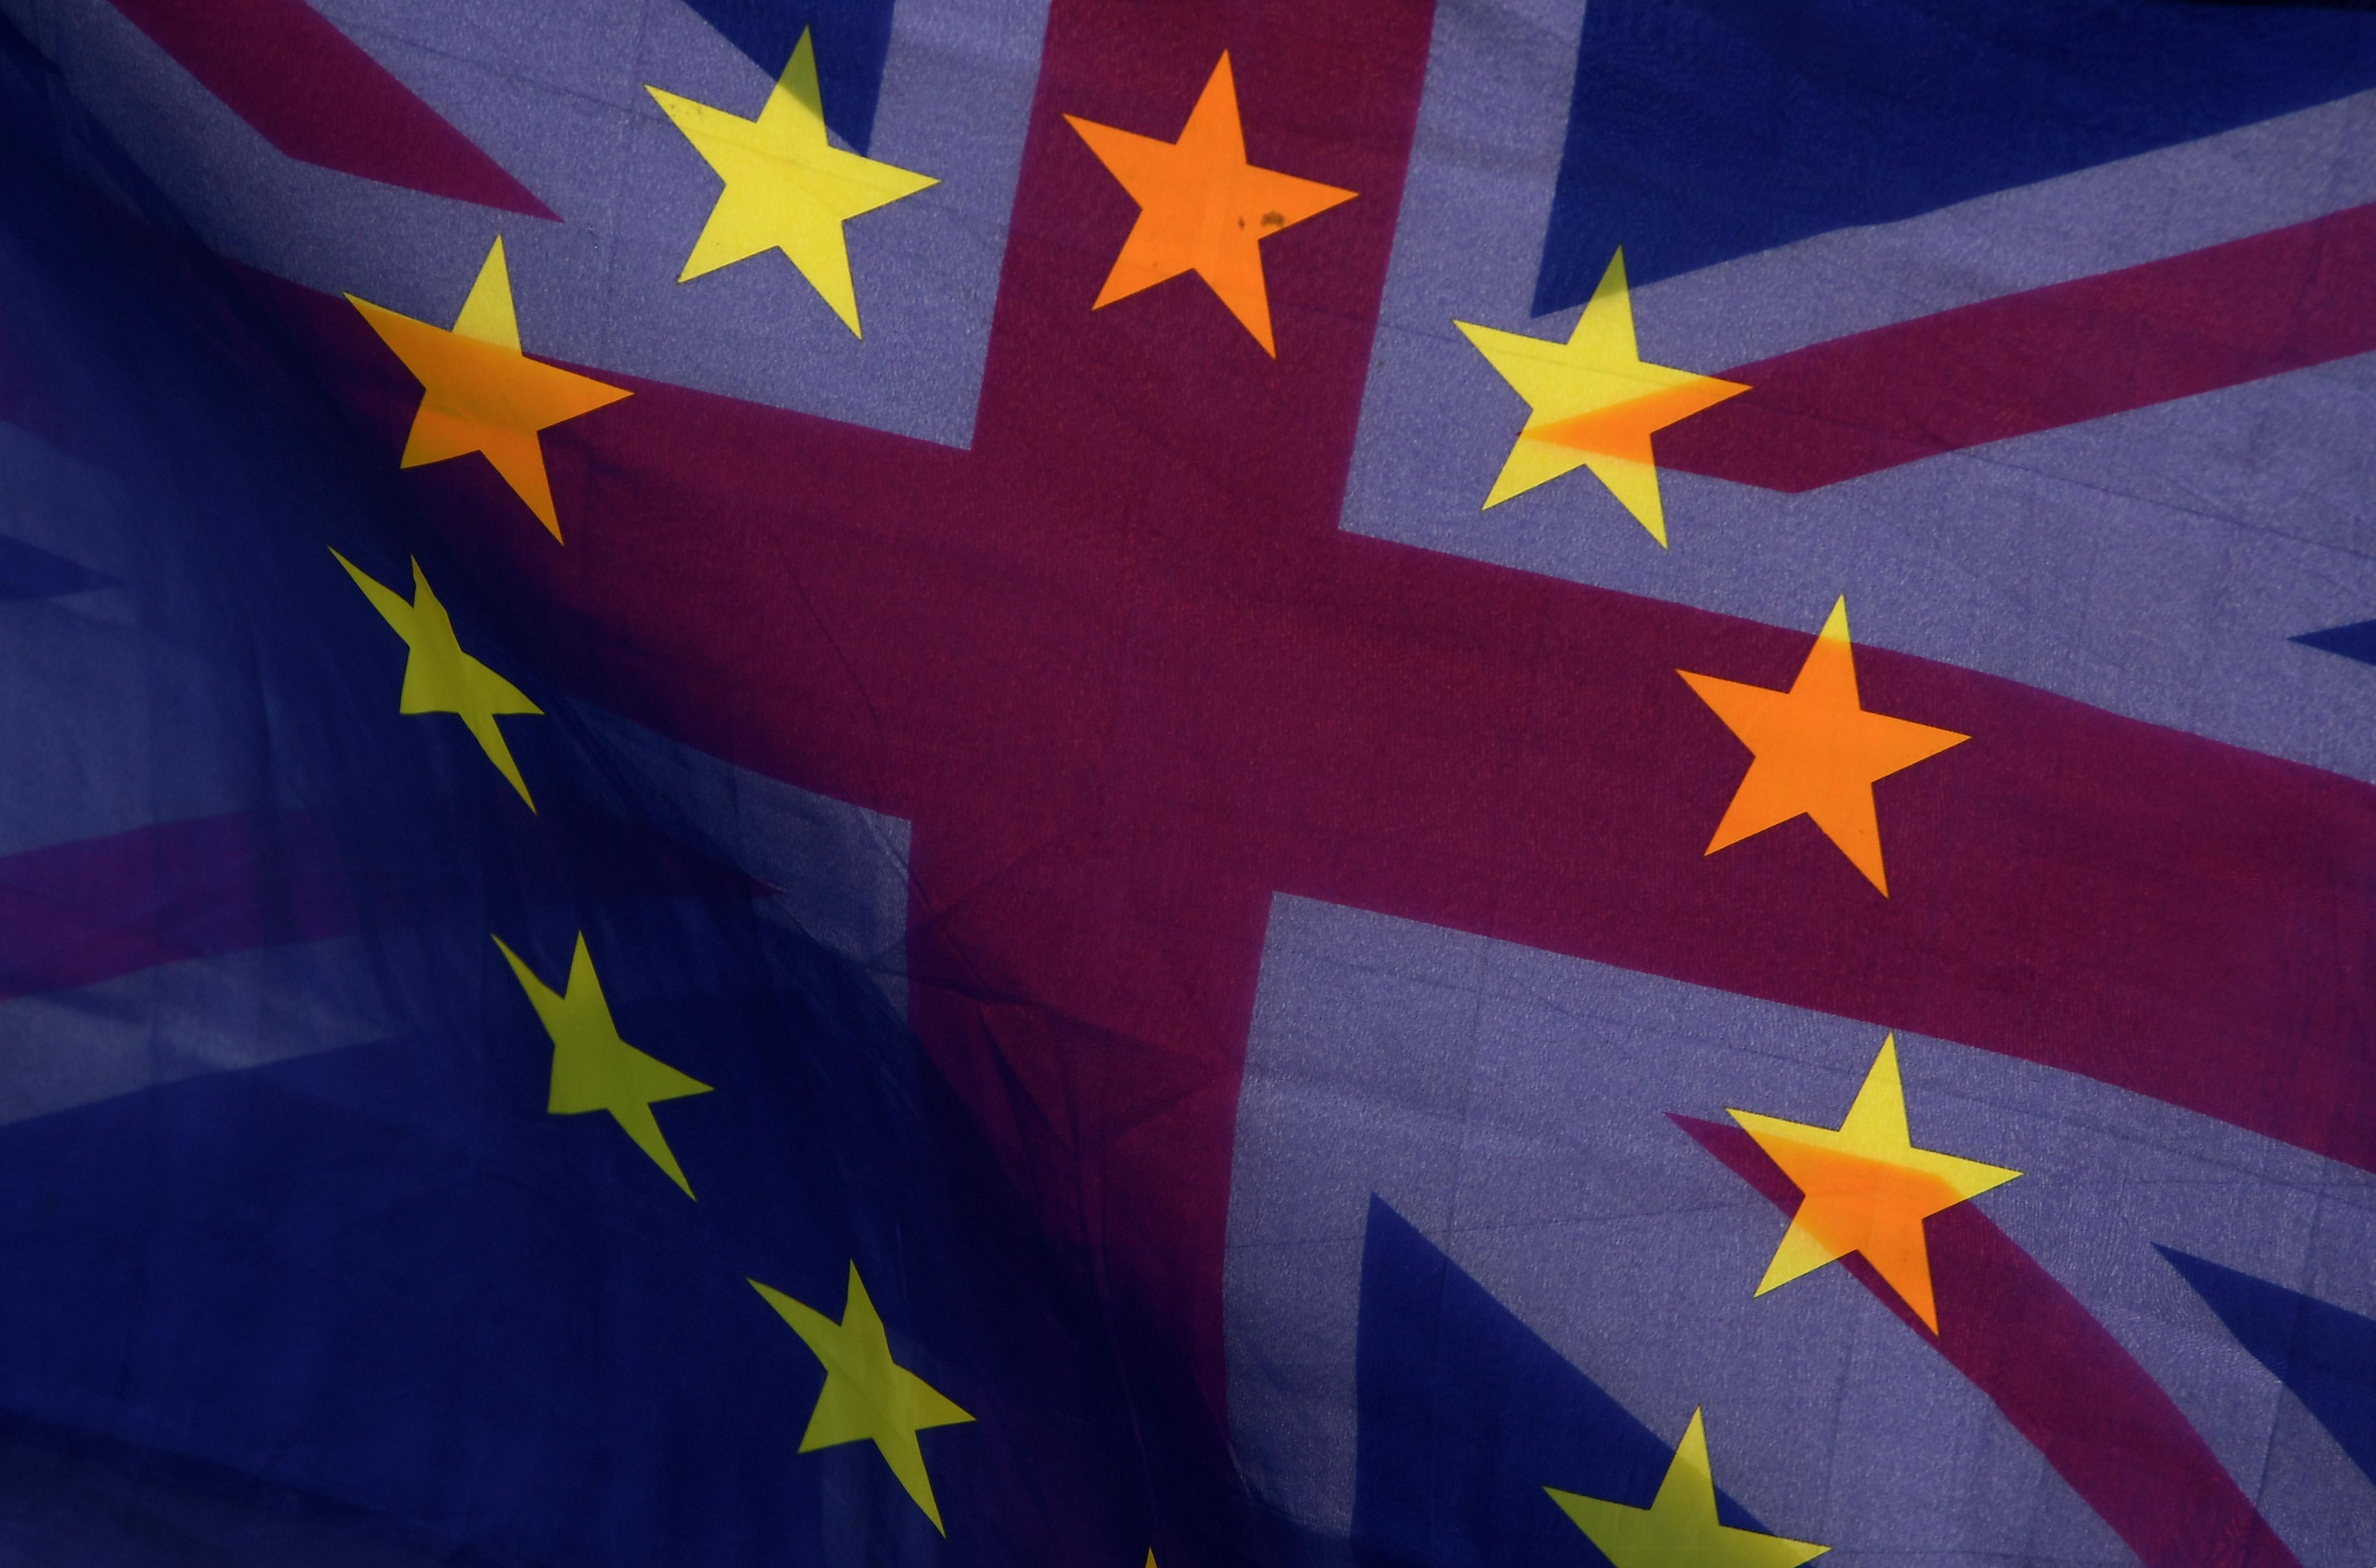 brexit-de-nombreux-expatries-peu-convaincus-par-les-avances-de-theresa-may